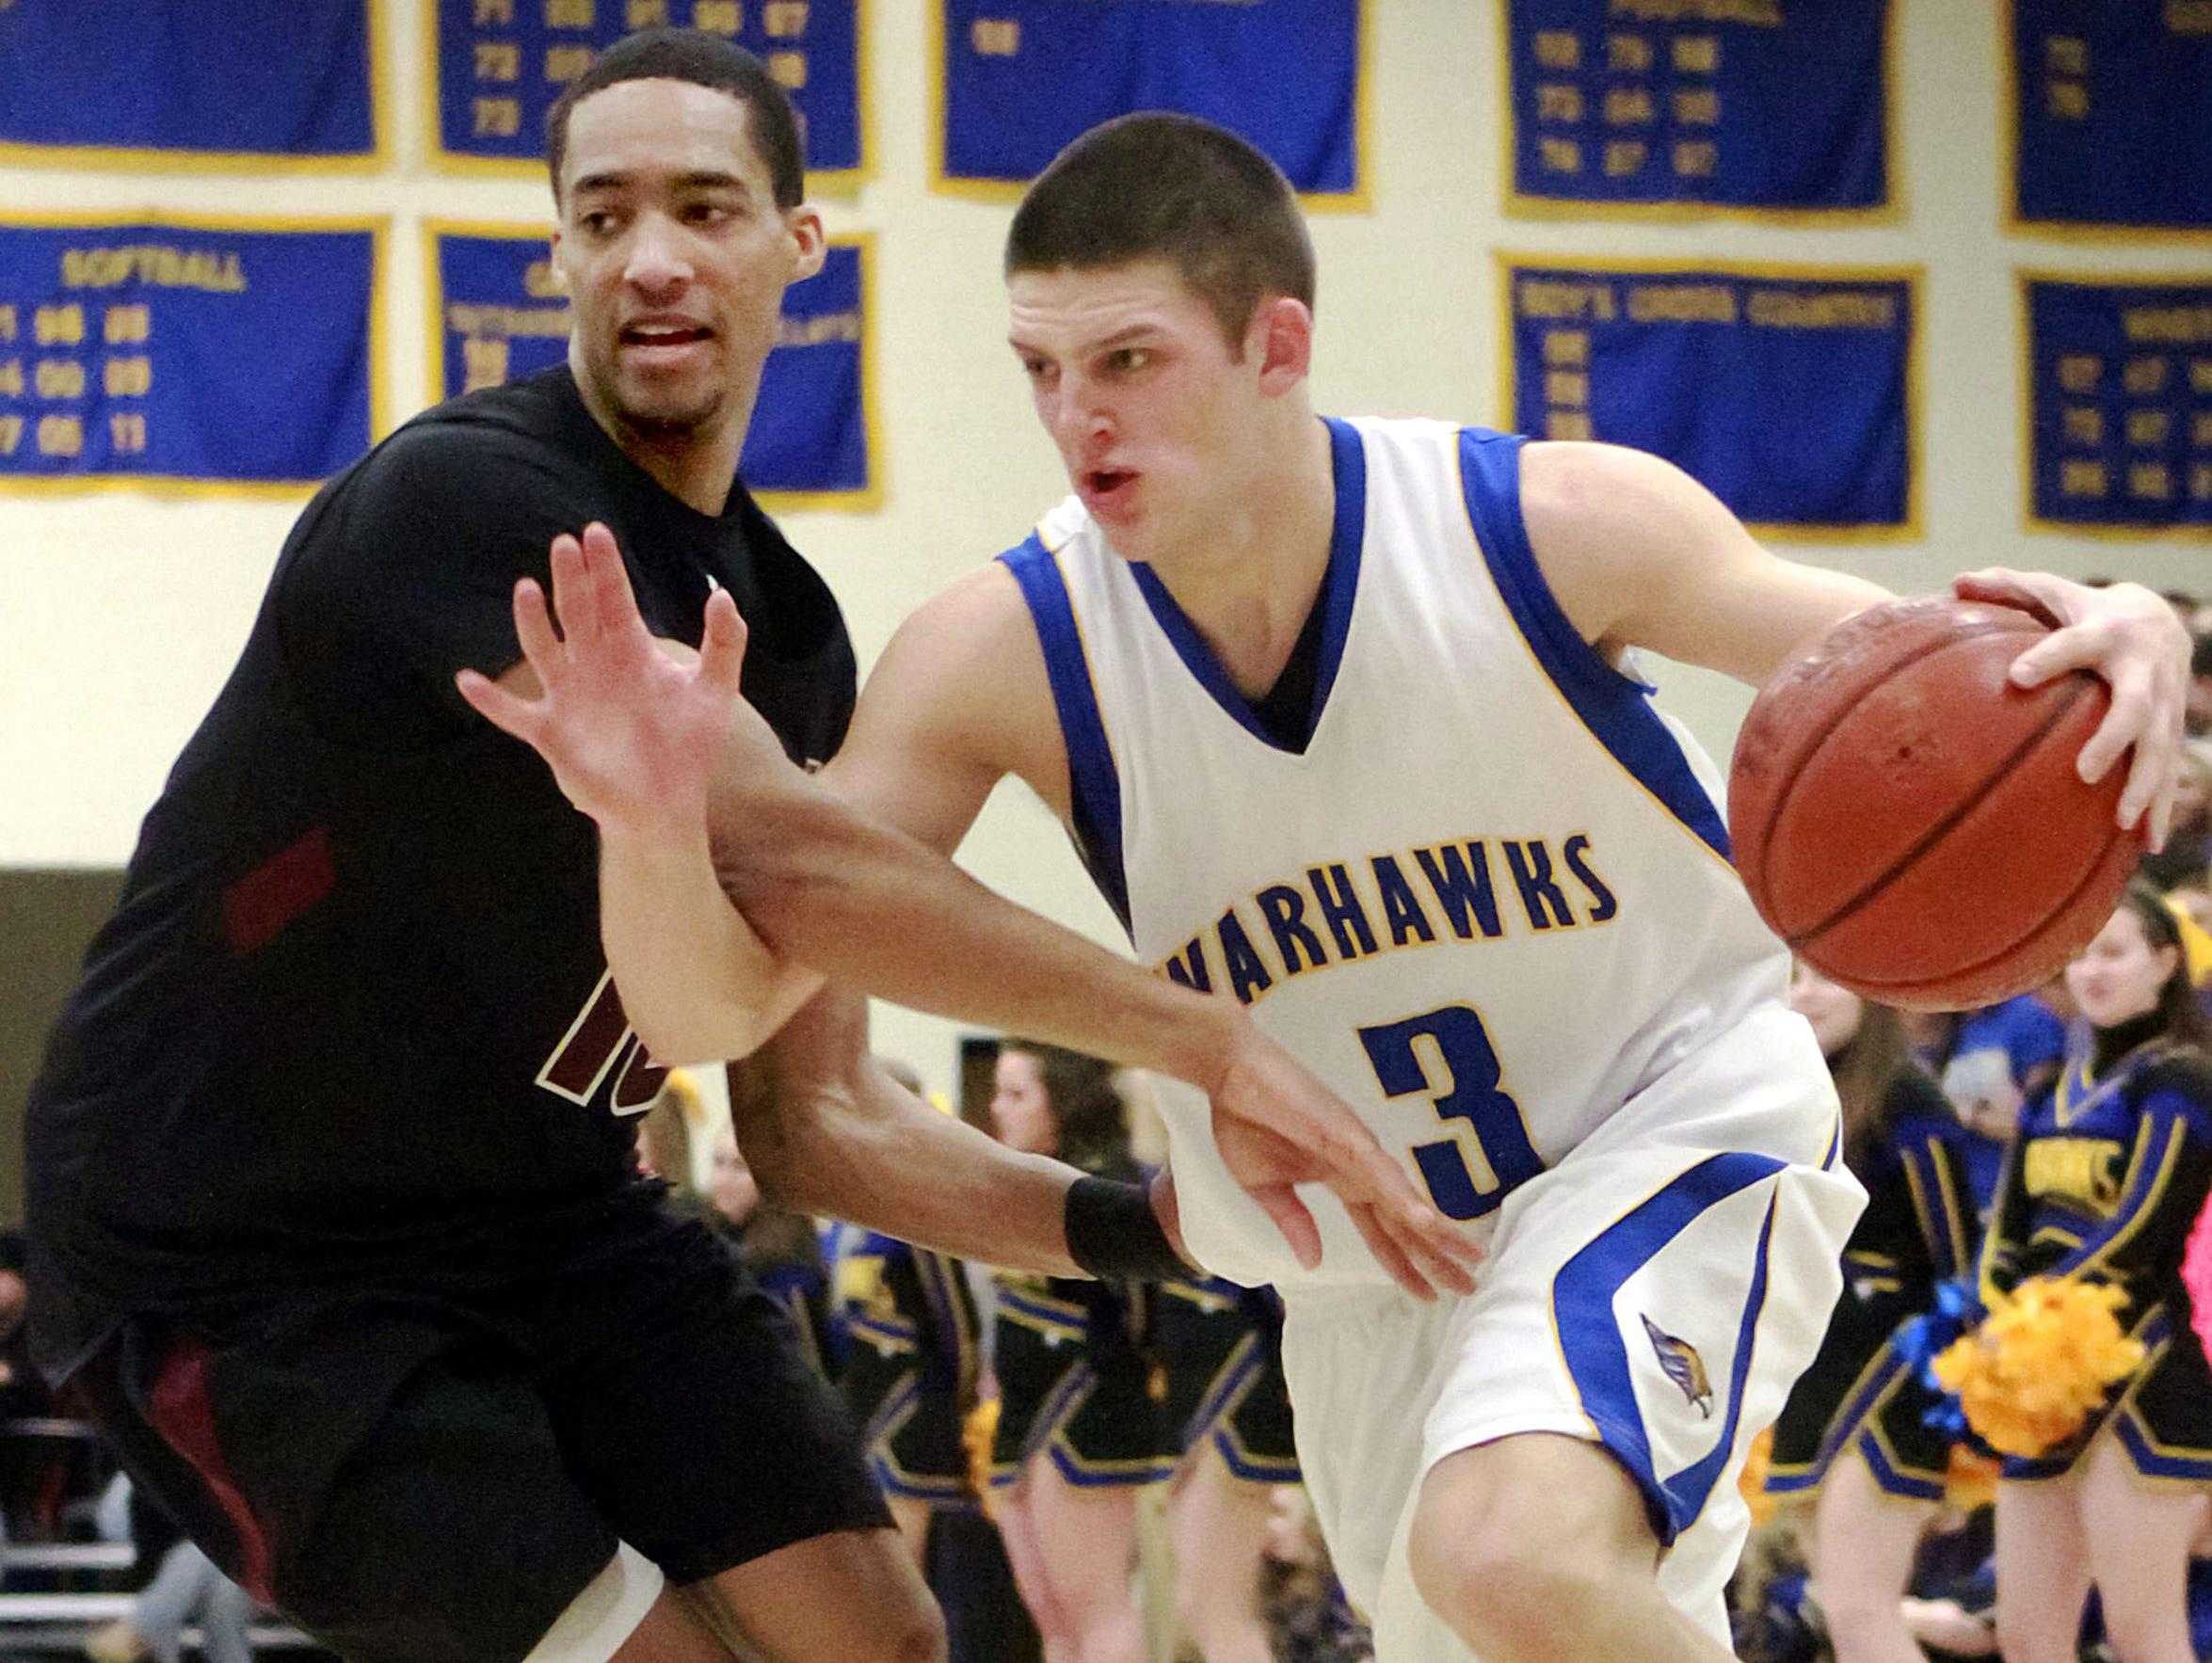 Germantown's Zak Showalter drives toward the basket